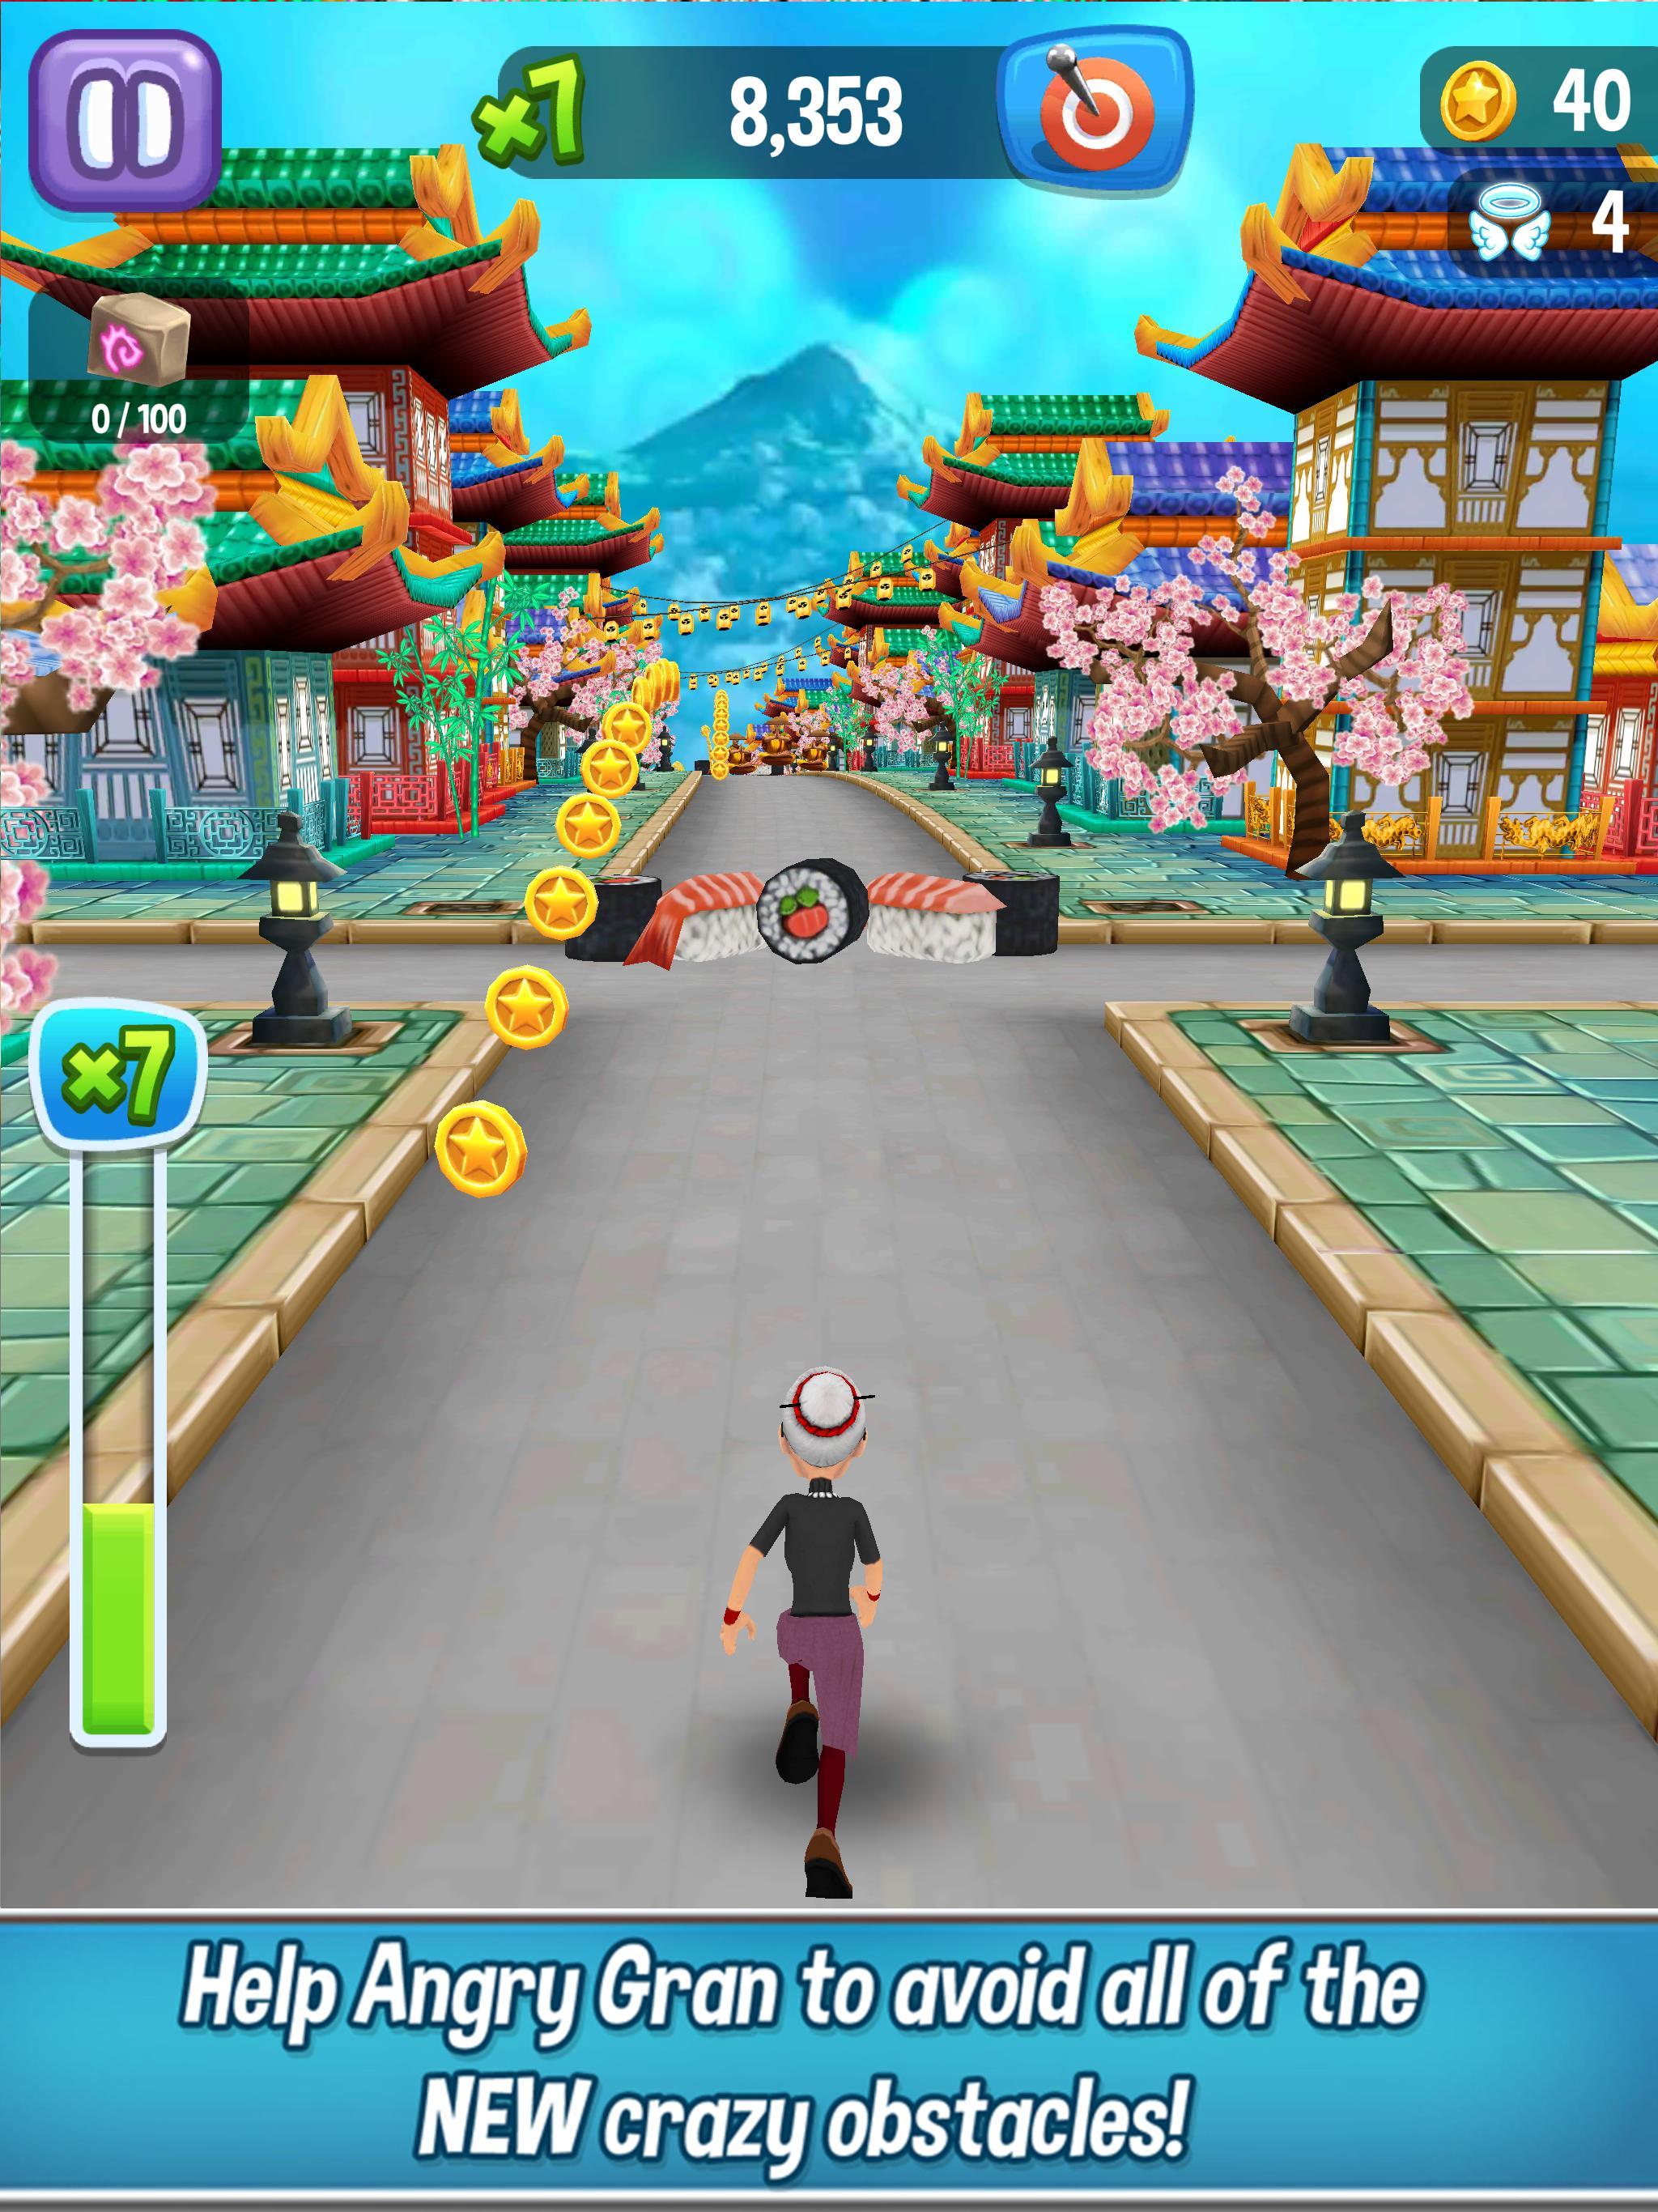 Angry Gran Run Running Game 2.12.1 Screenshot 10